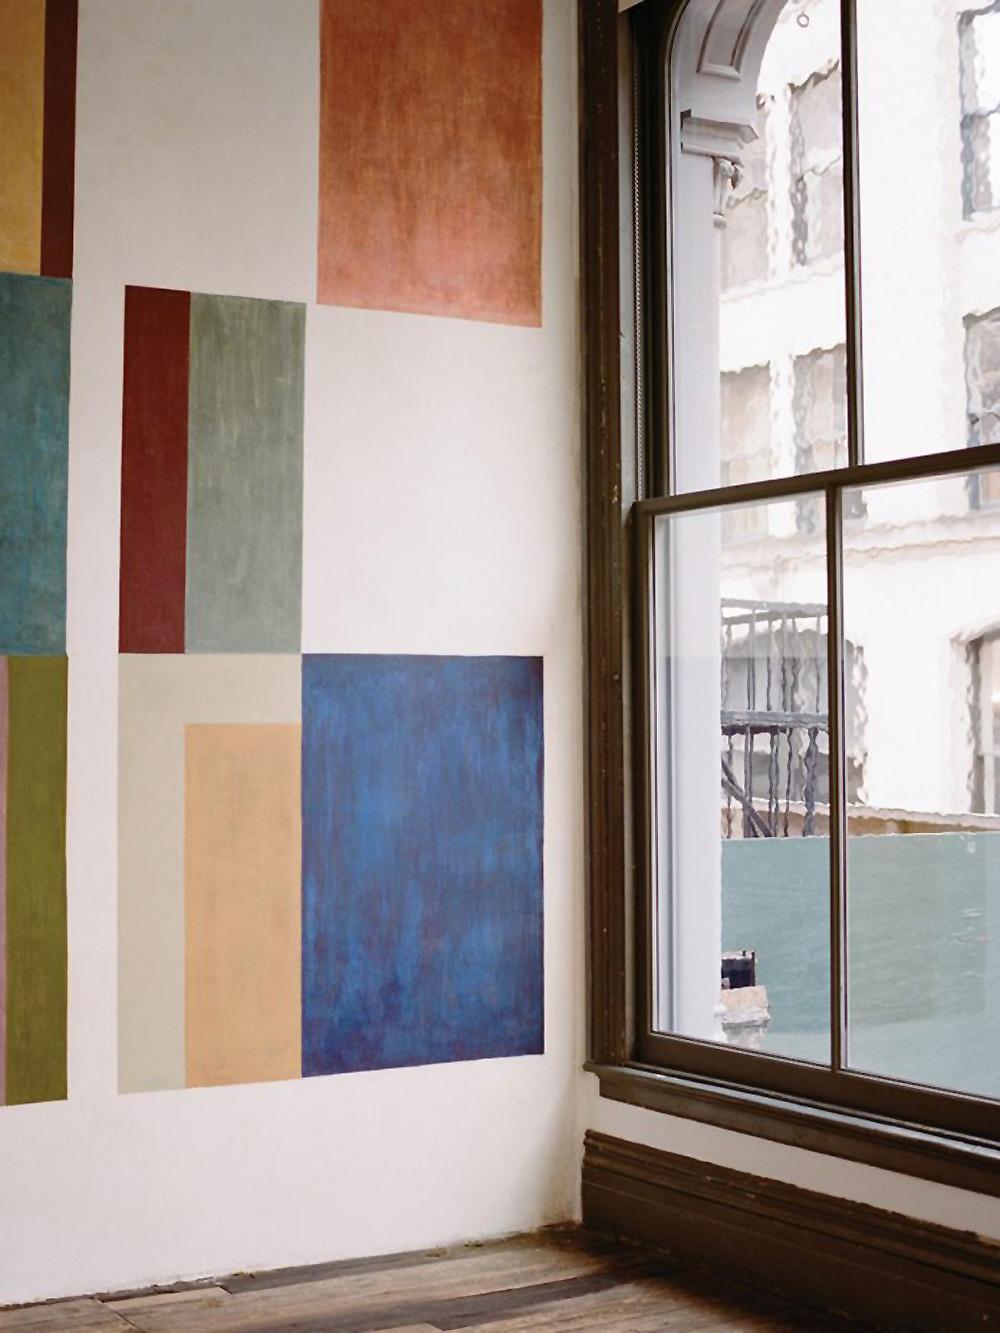 Donald Judd, Judd Foundation, interiors, sunday sanctuary, oracle fox, art